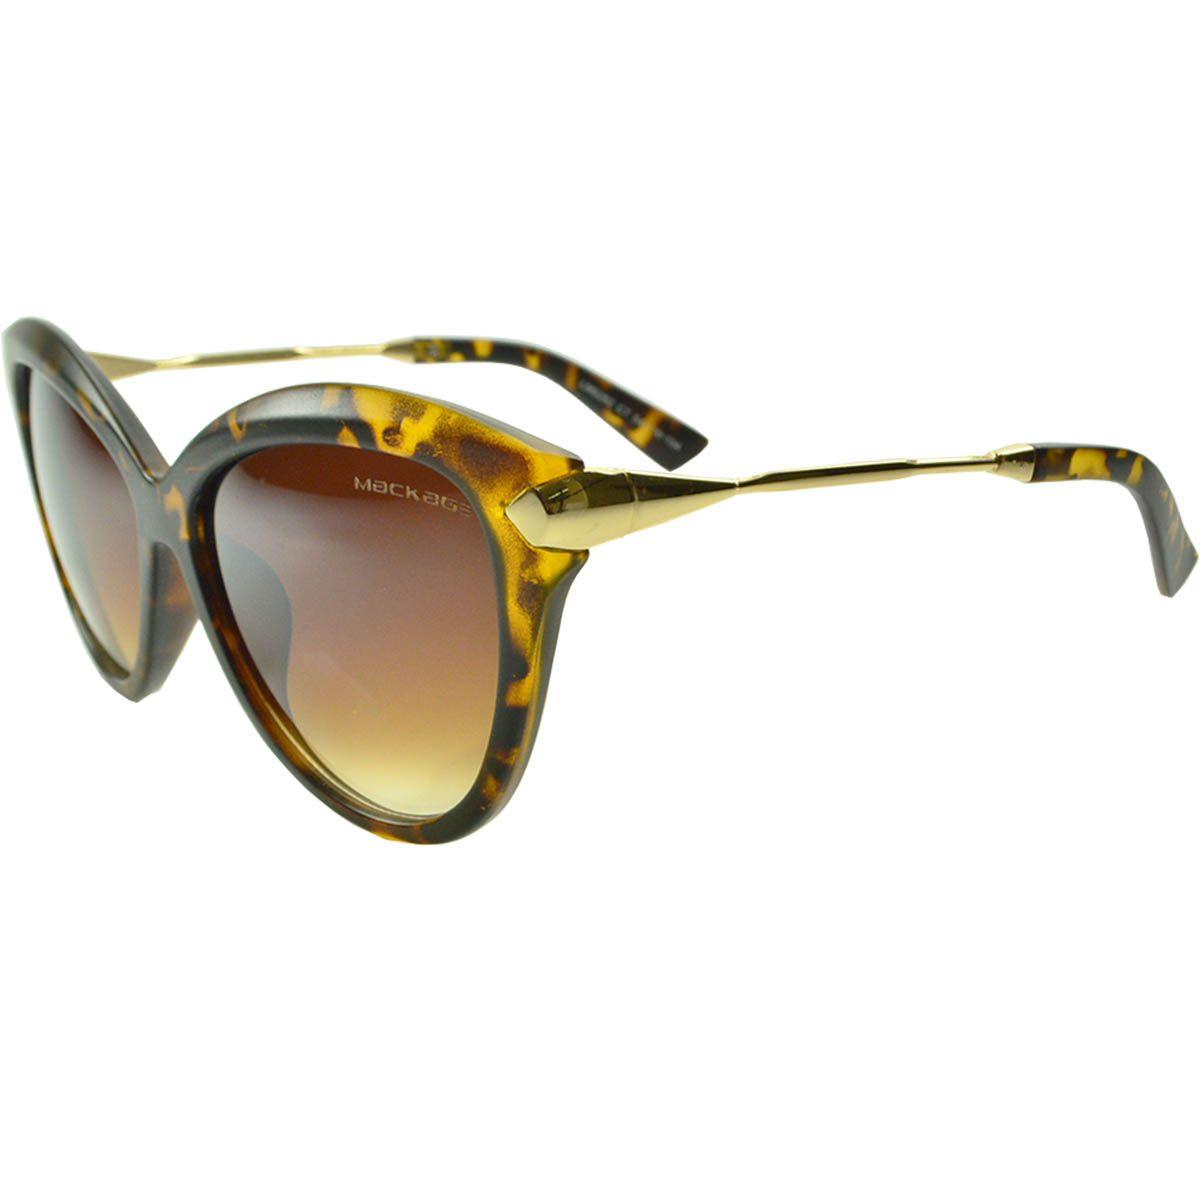 78b02f60a8e79 Óculos de Sol Feminino Mackage MK9282T Tarta